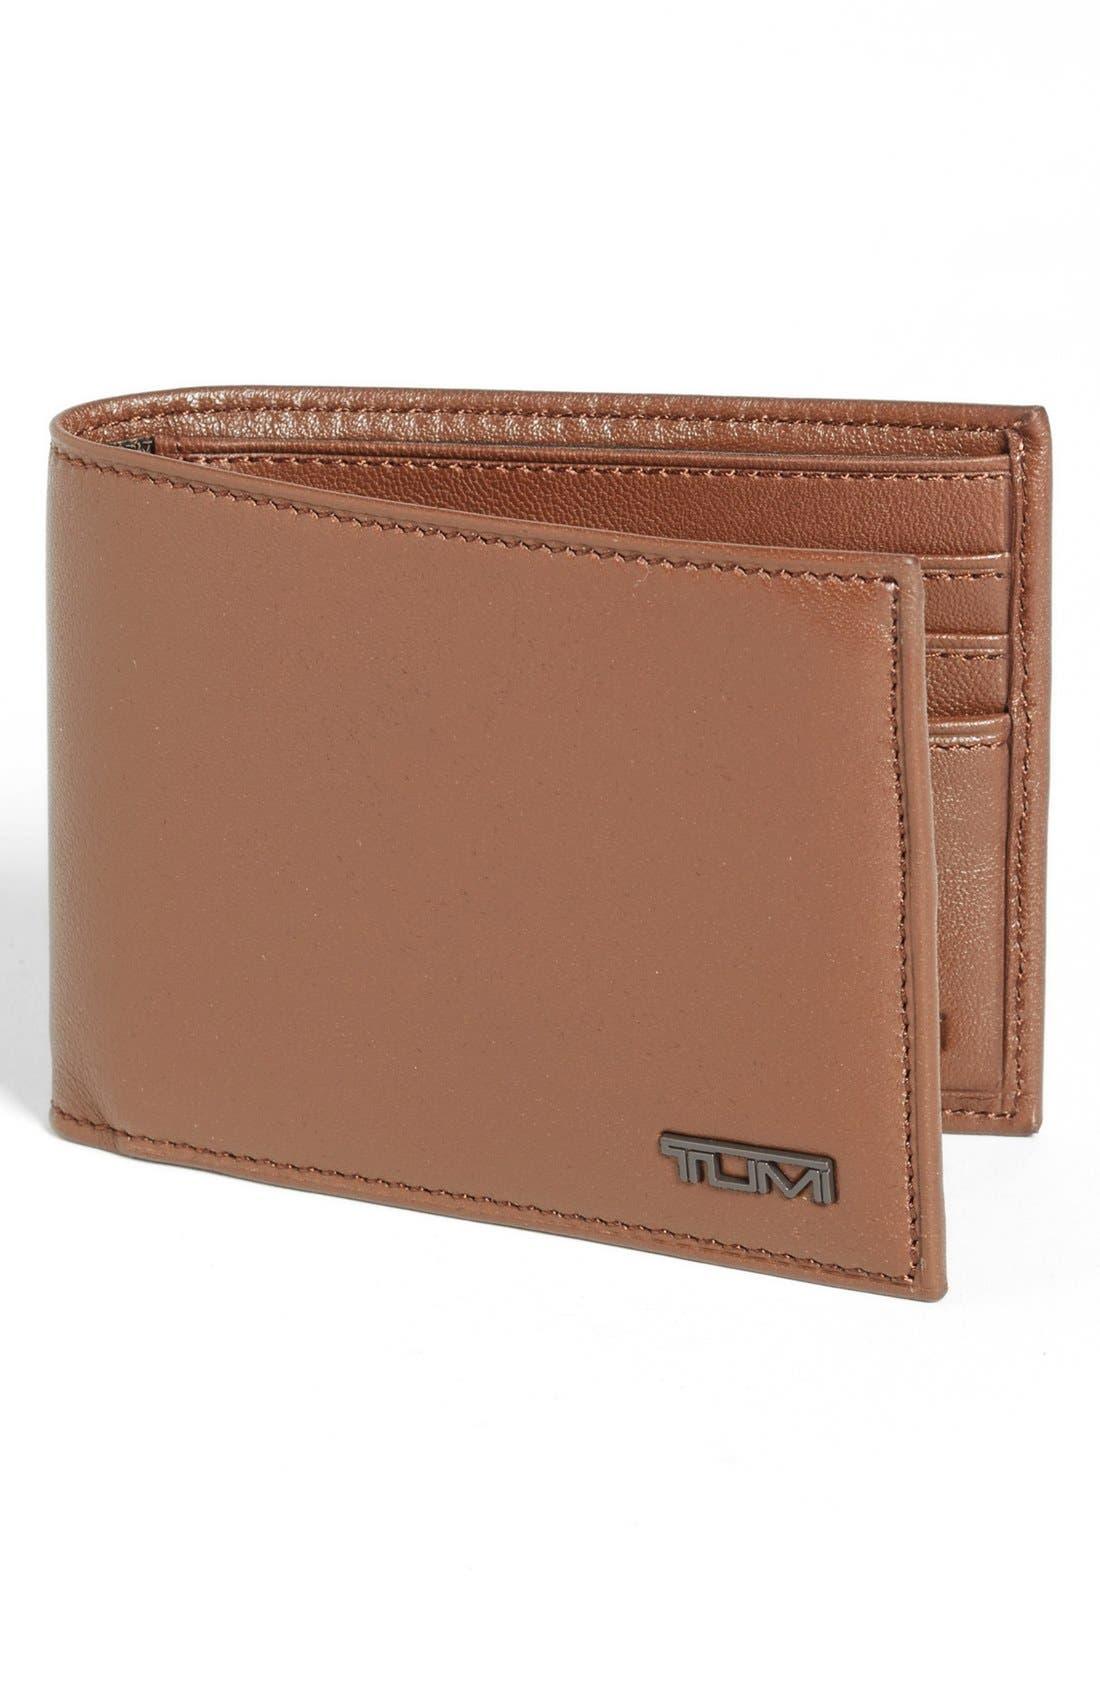 Alternate Image 1 Selected - Tumi 'Delta Double' Billfold Wallet